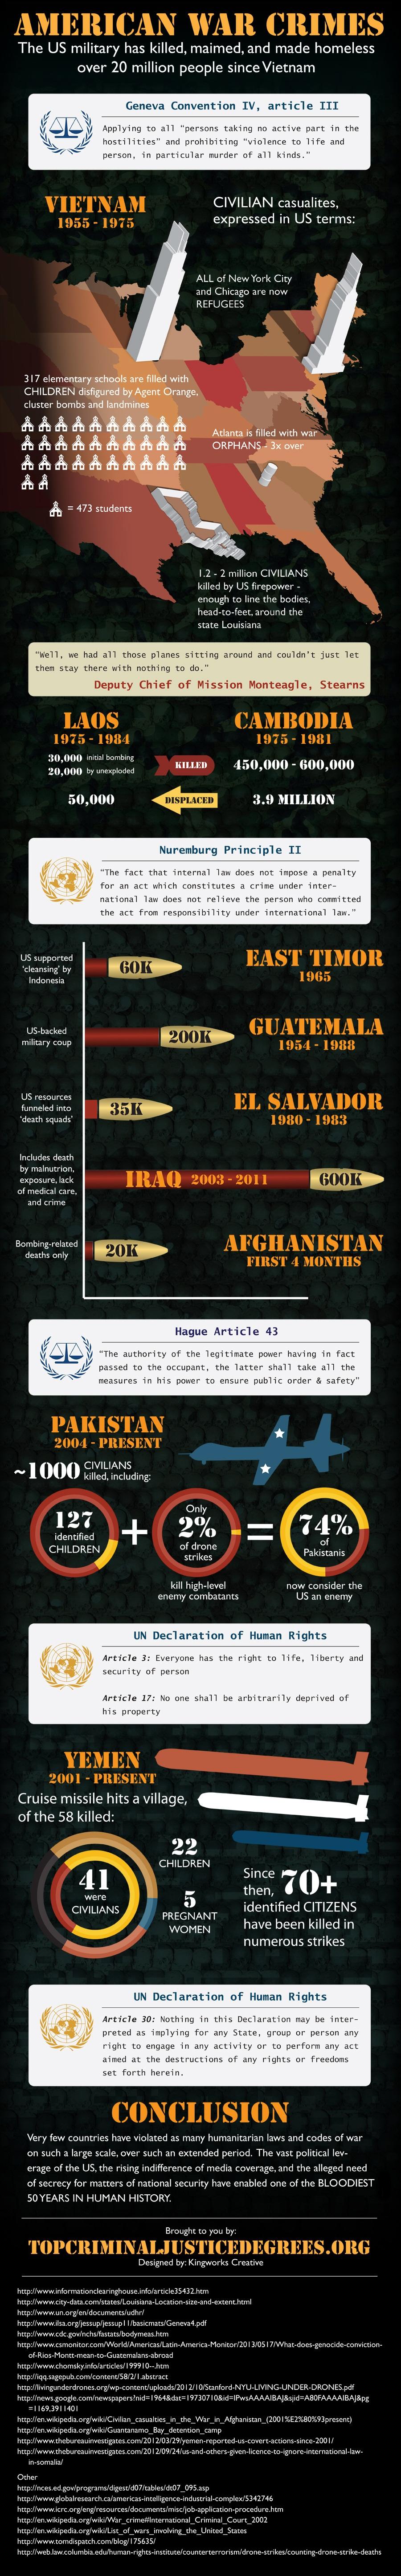 American War Crimes